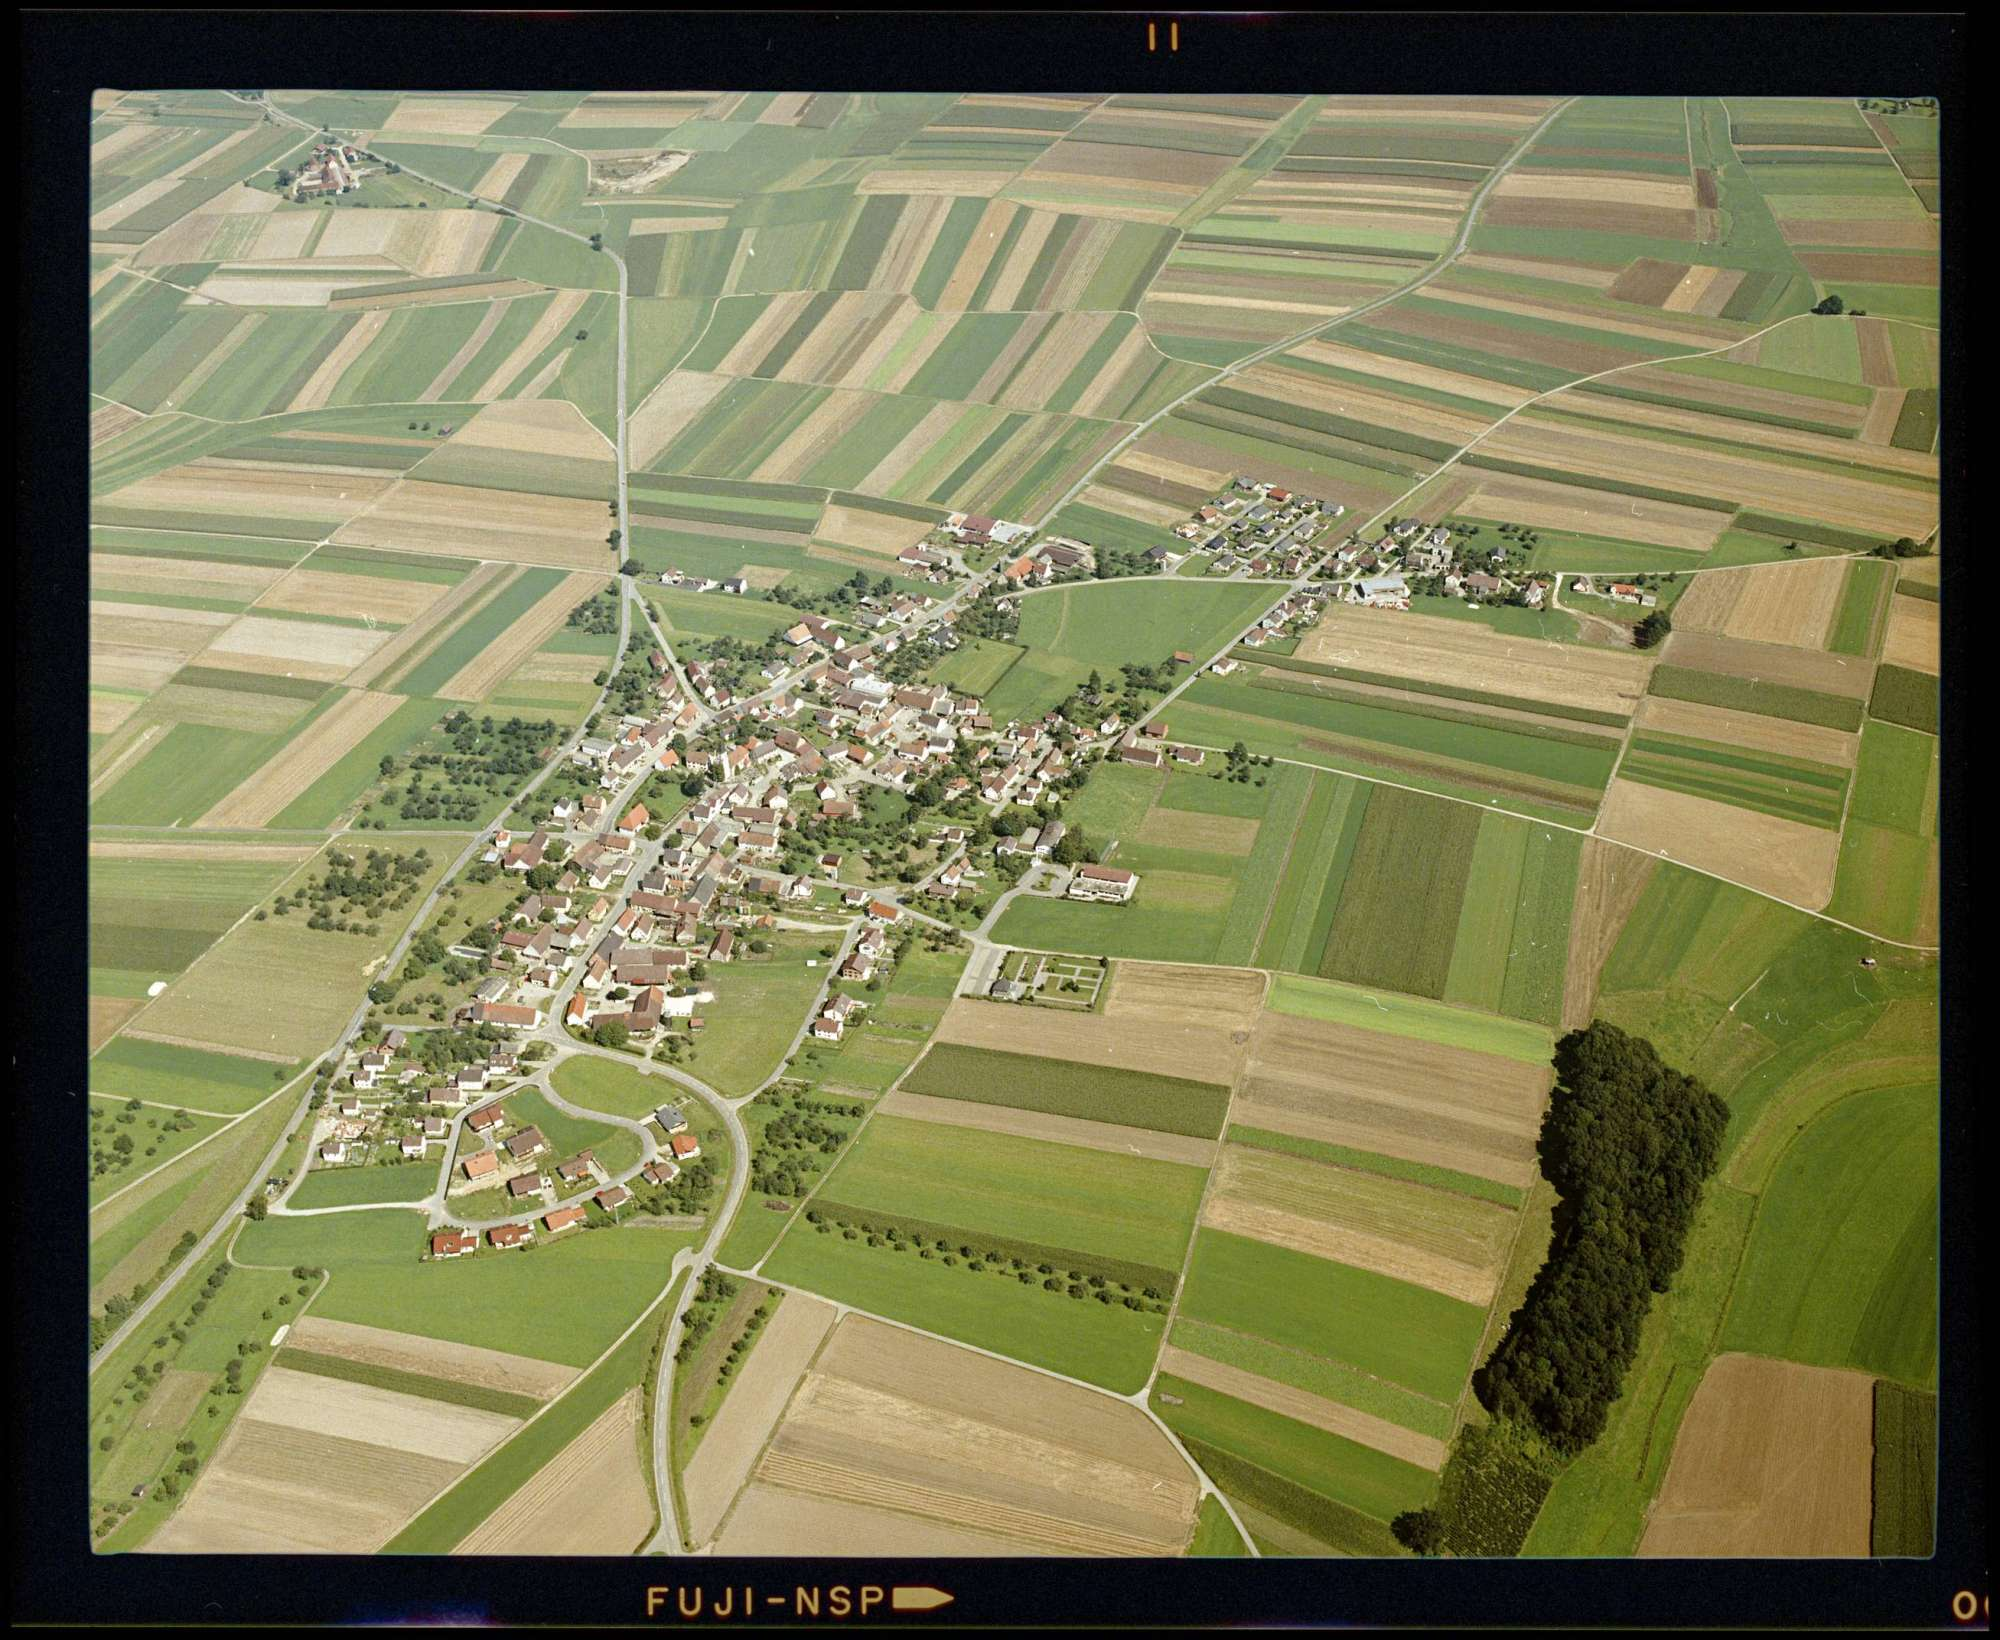 Oberholzheim, Luftbild, Bild 1